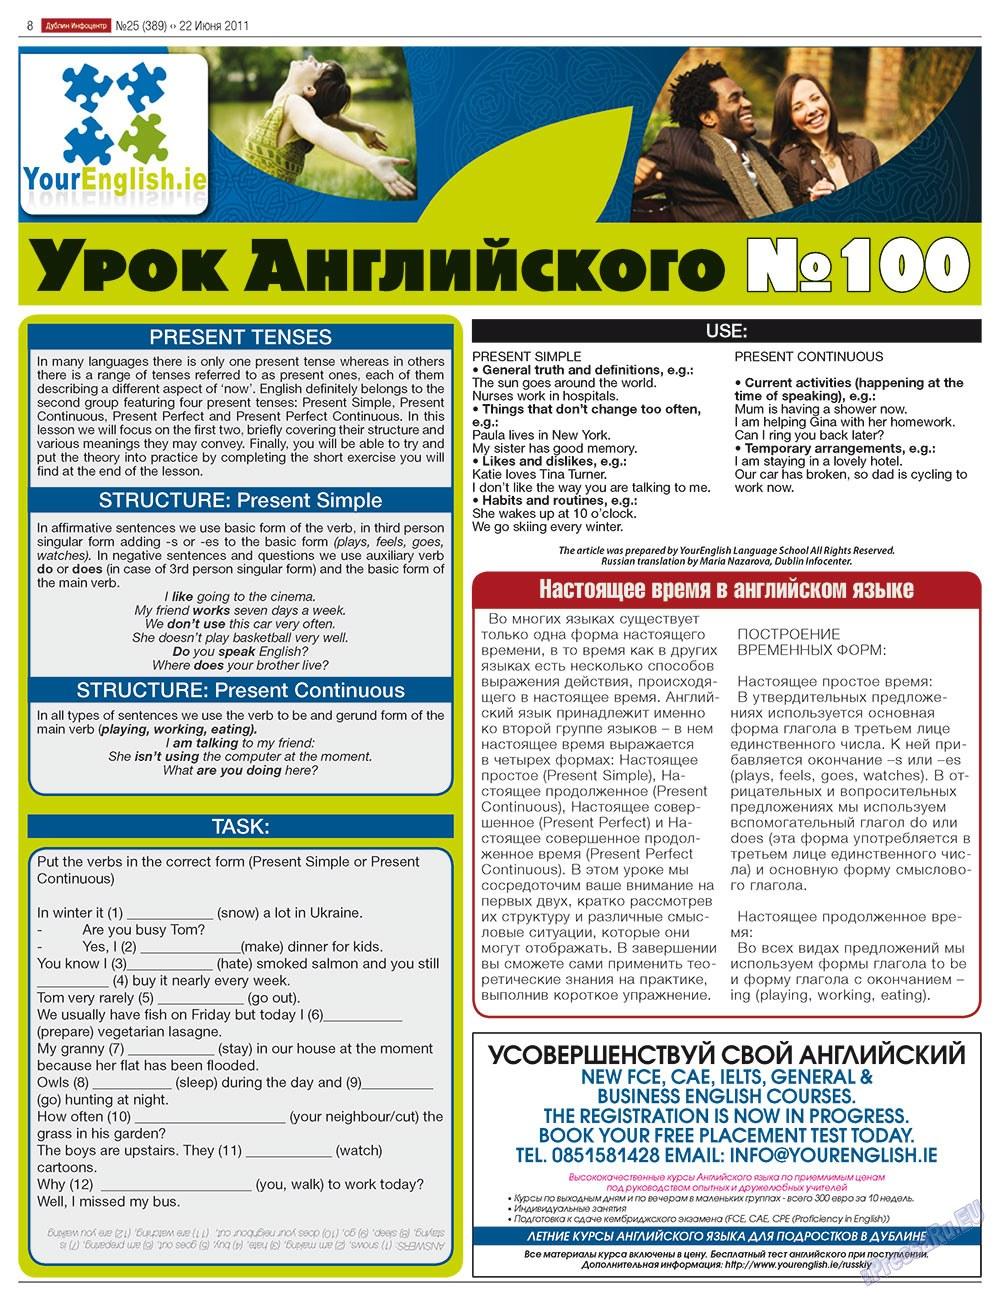 Дублин инфоцентр (газета). 2011 год, номер 25, стр. 8